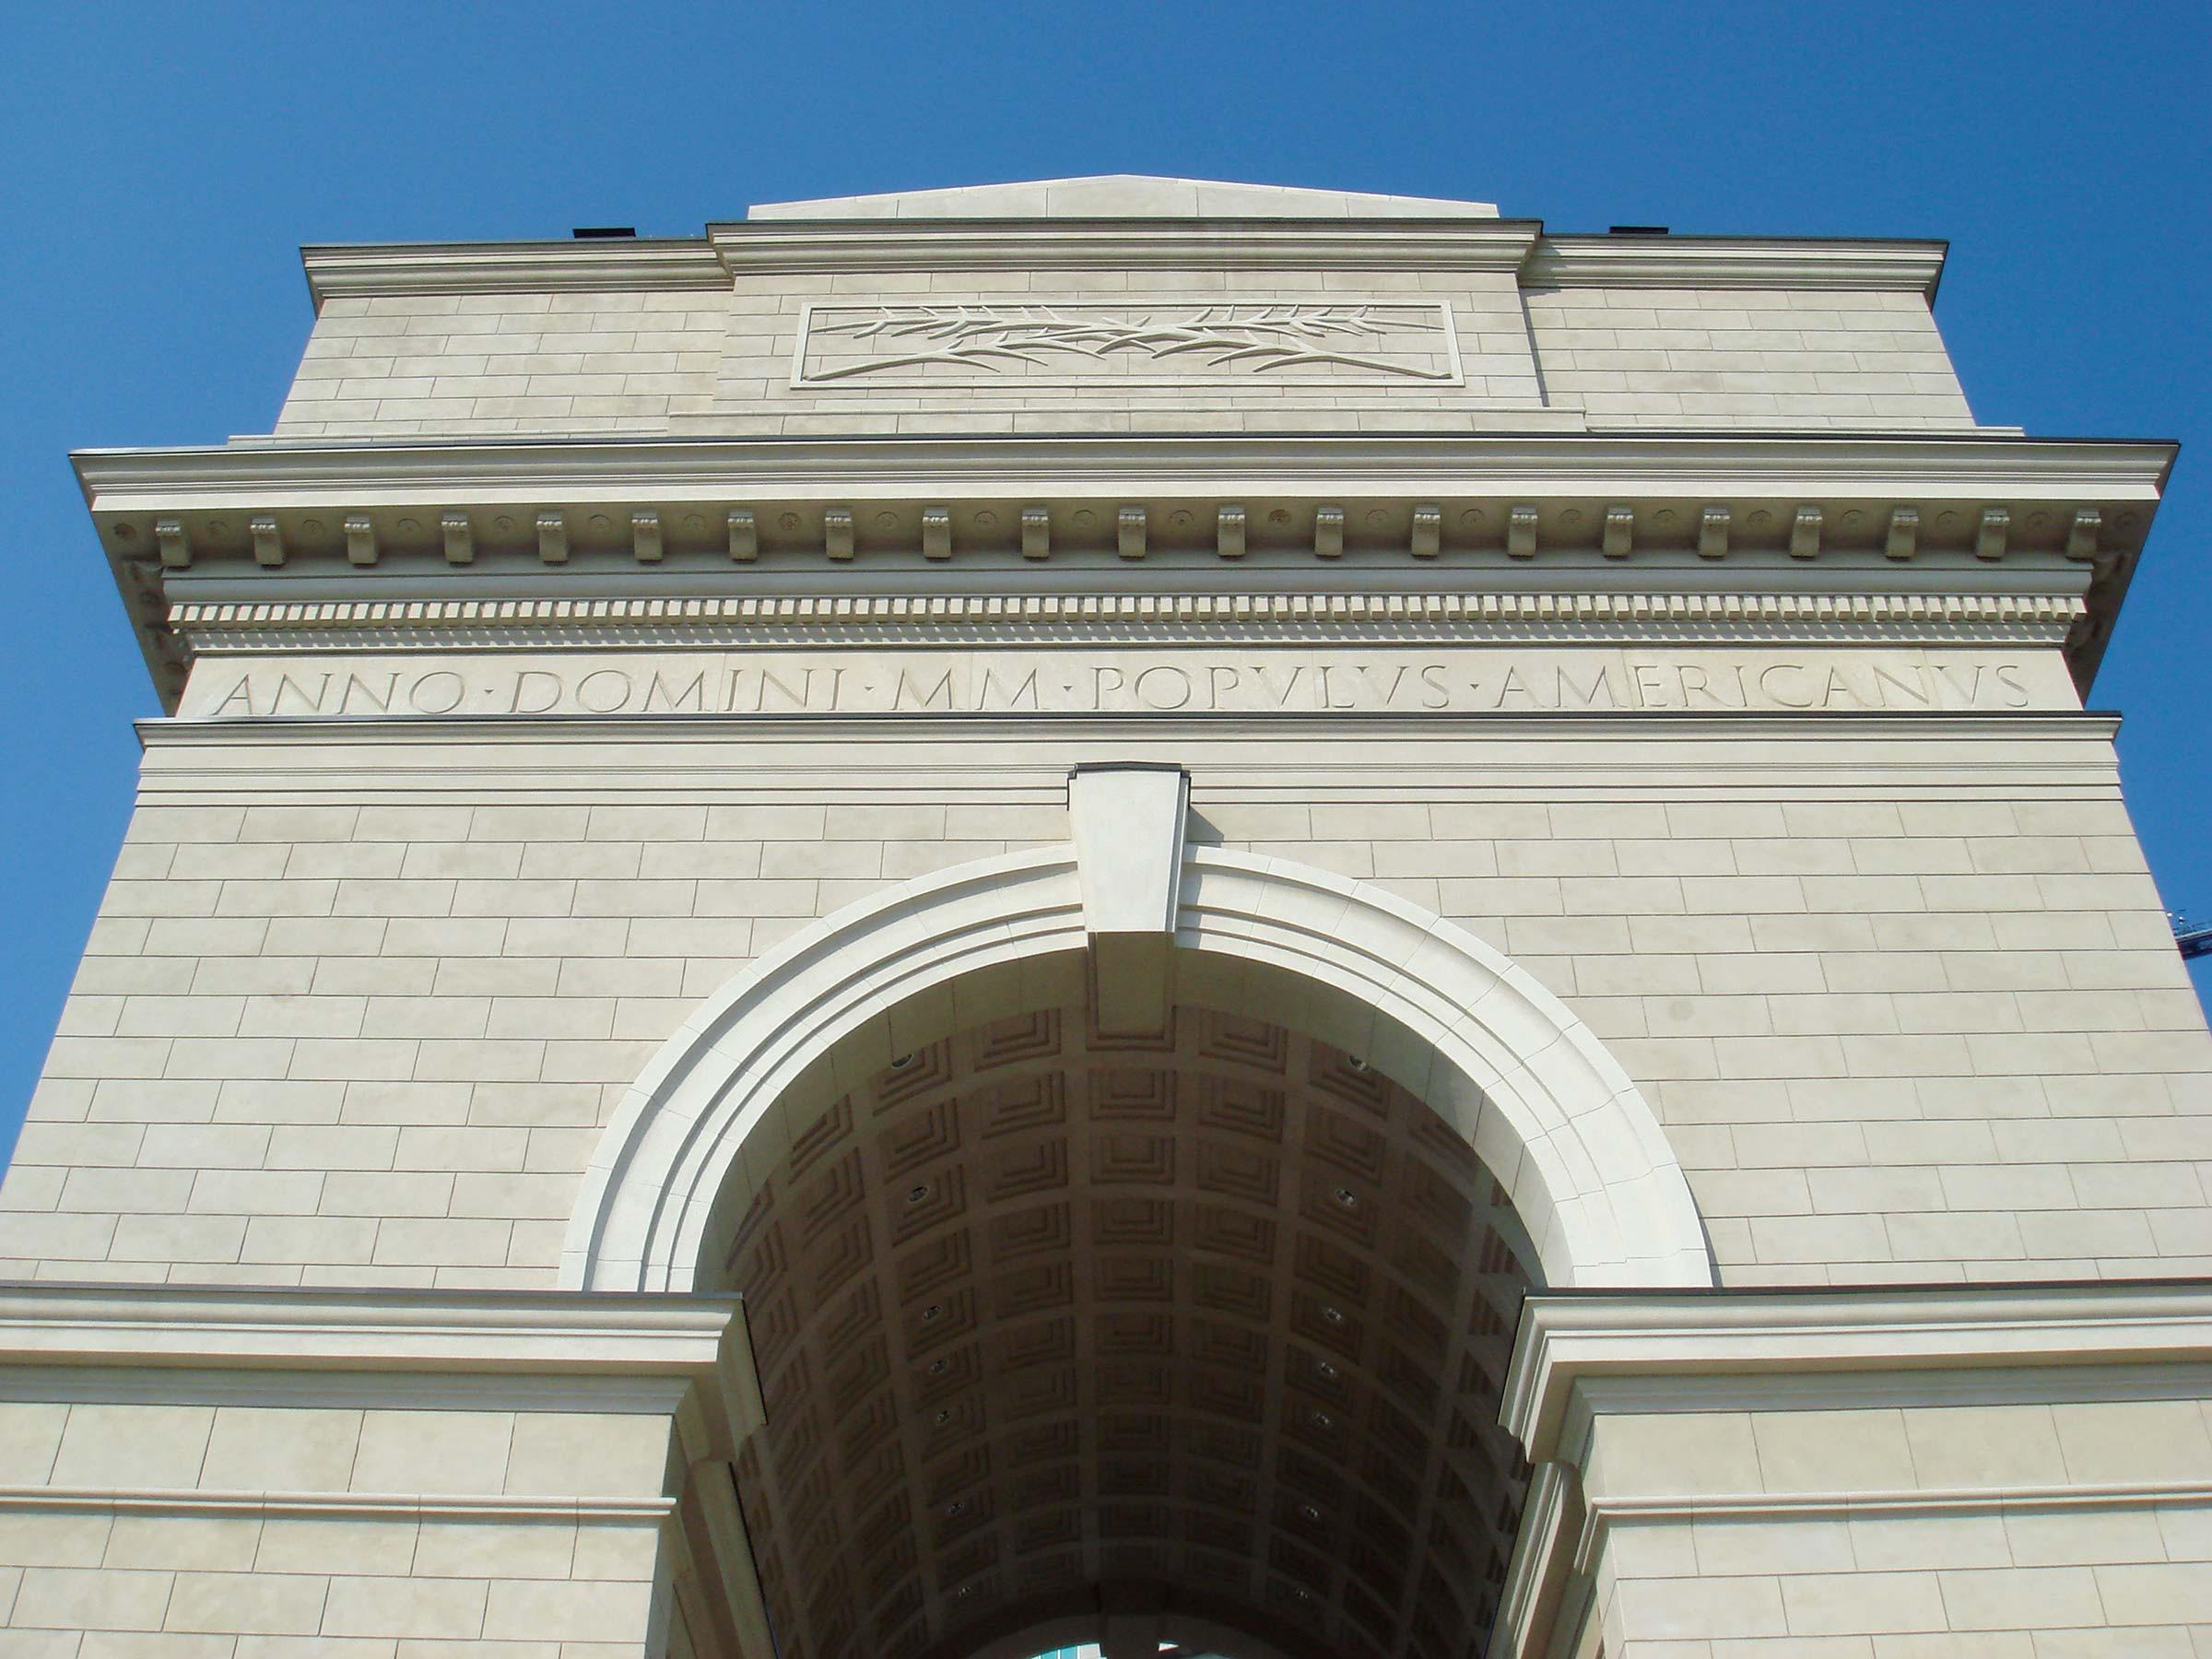 Millennium Gate, Atlanta, USA